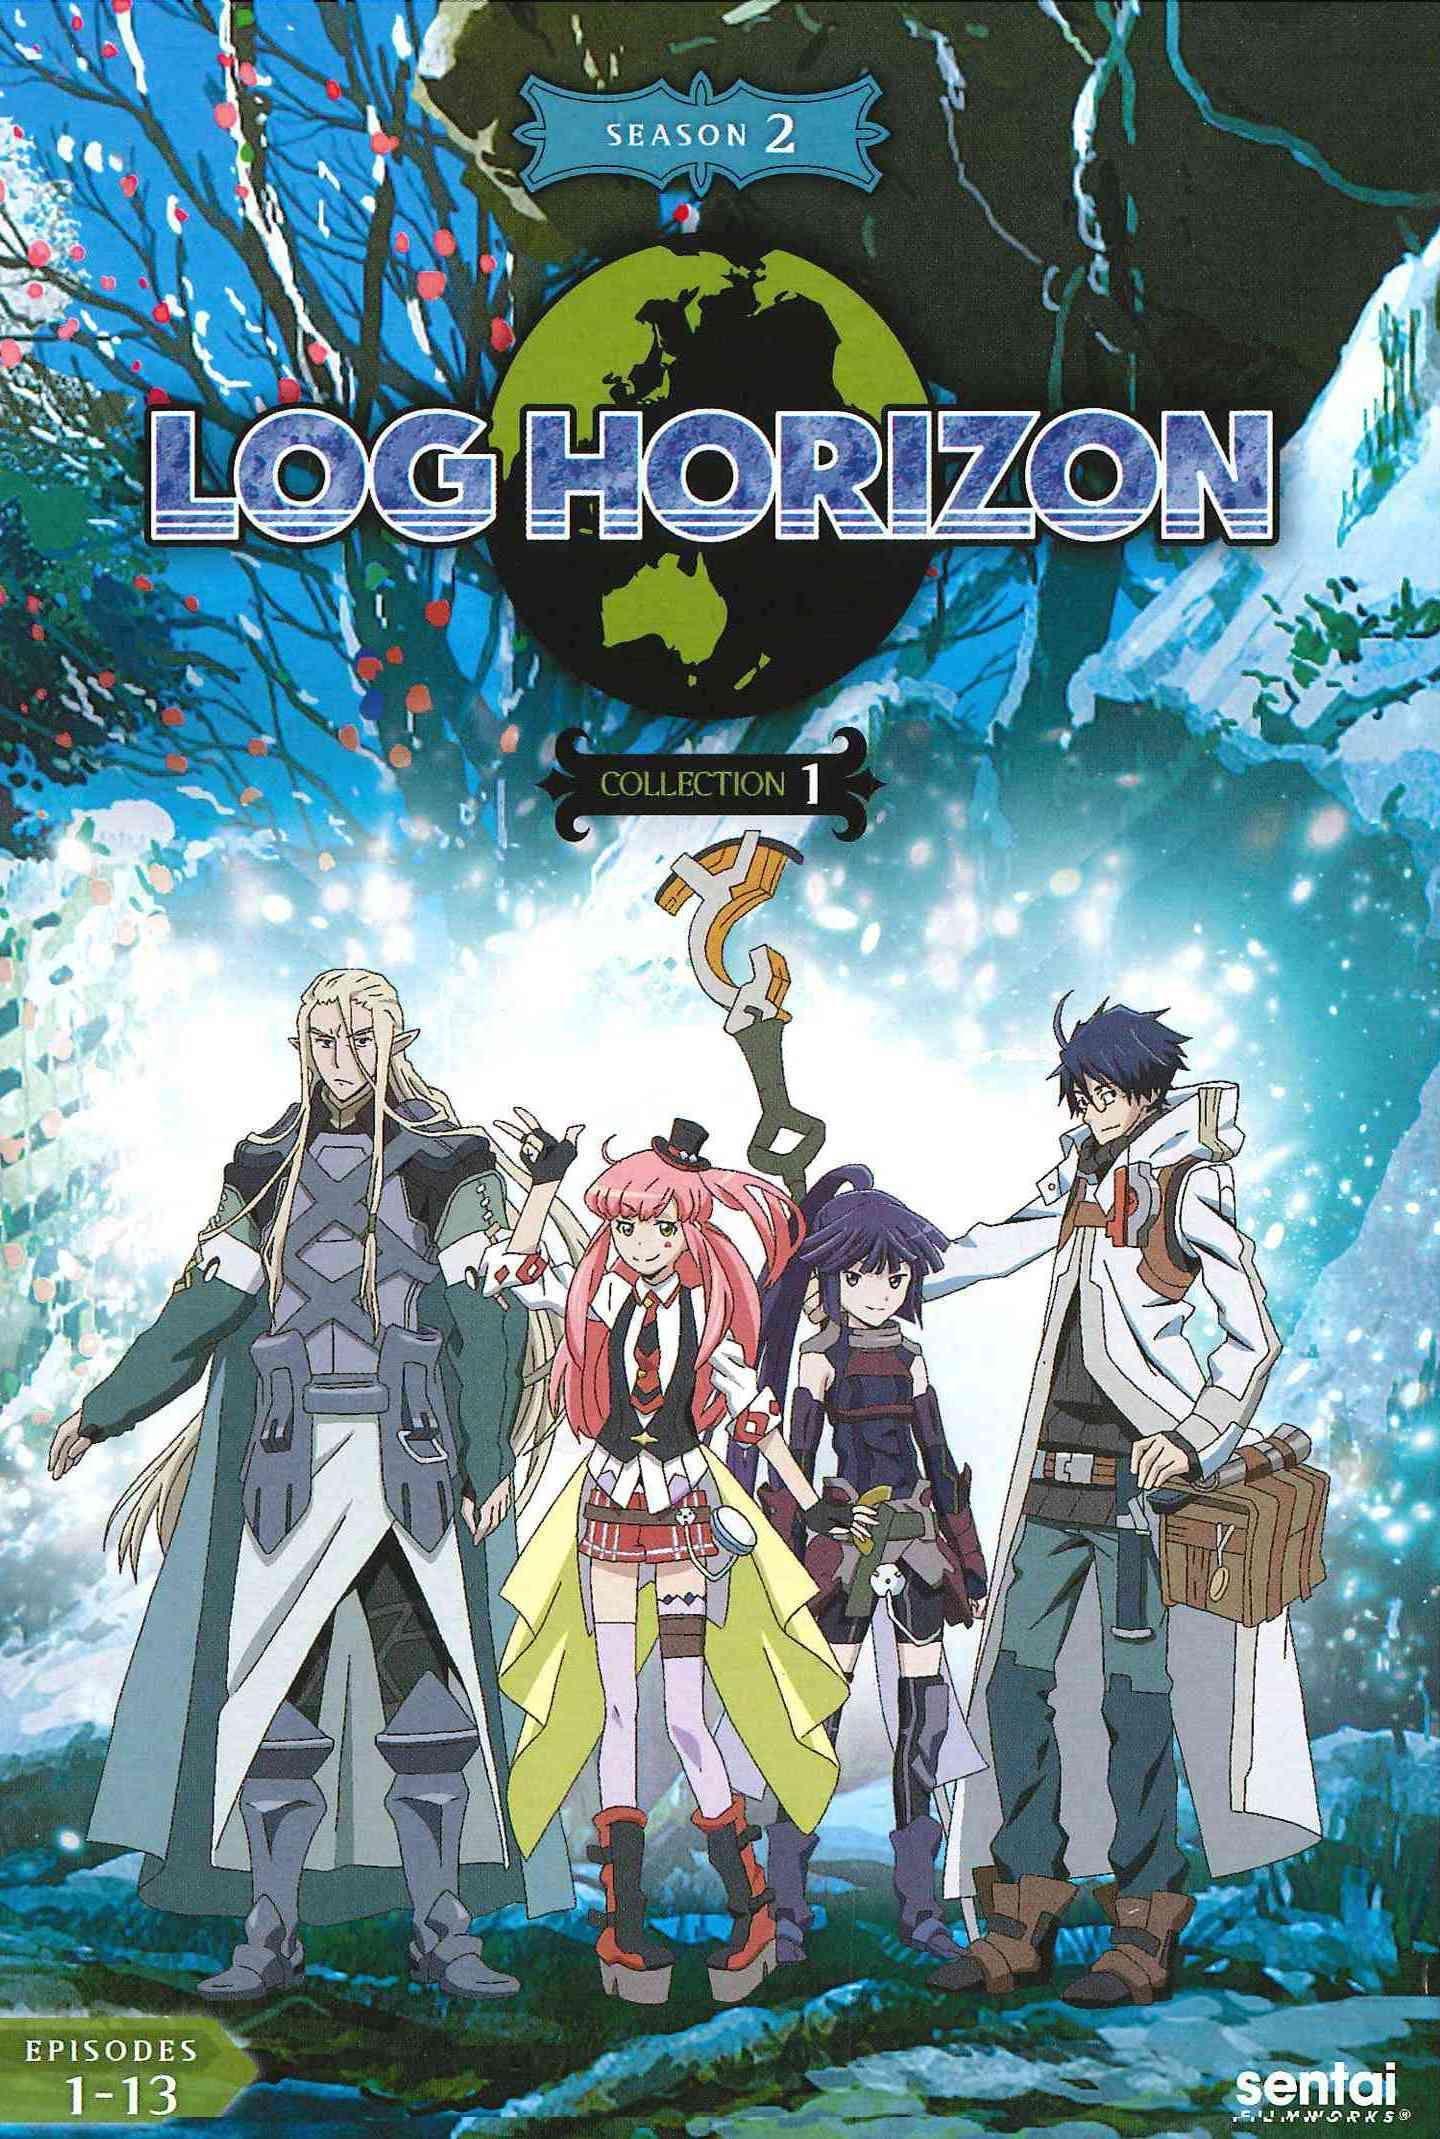 Log Horizon 2 Collection 1 Log horizon, Log horizon